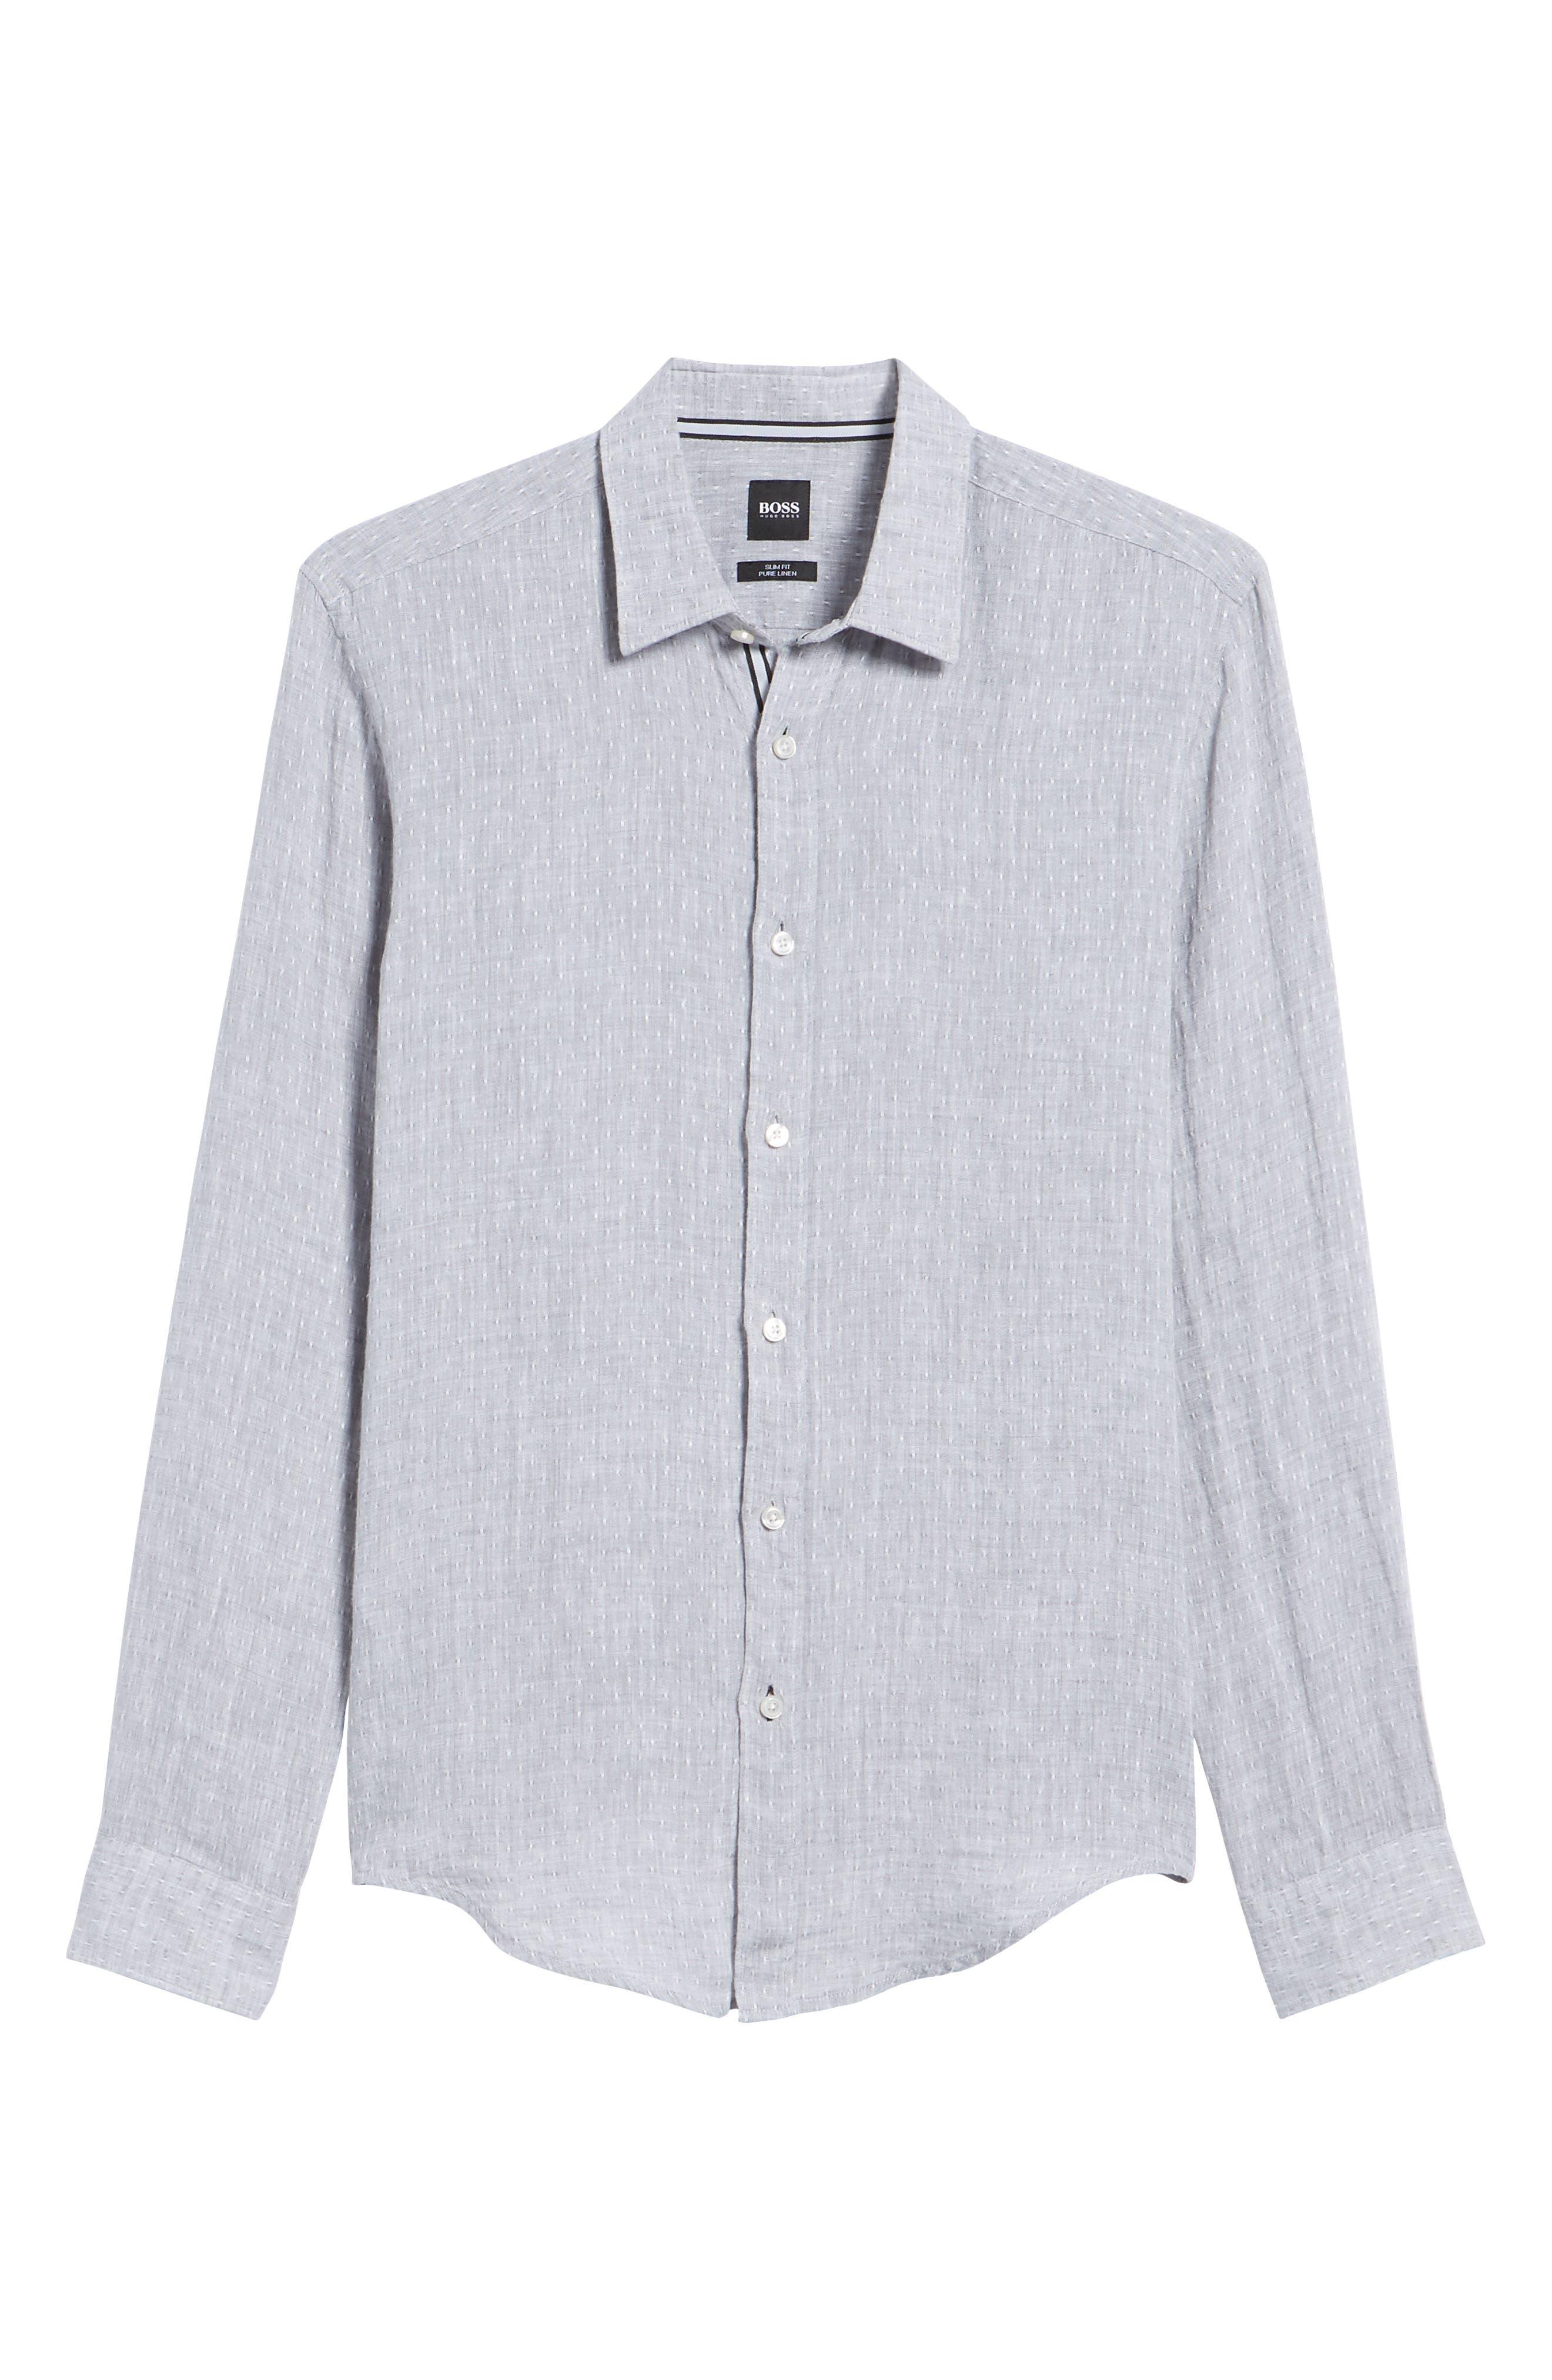 Ronni Slim Fit Dobby Linen Sport Shirt,                             Alternate thumbnail 11, color,